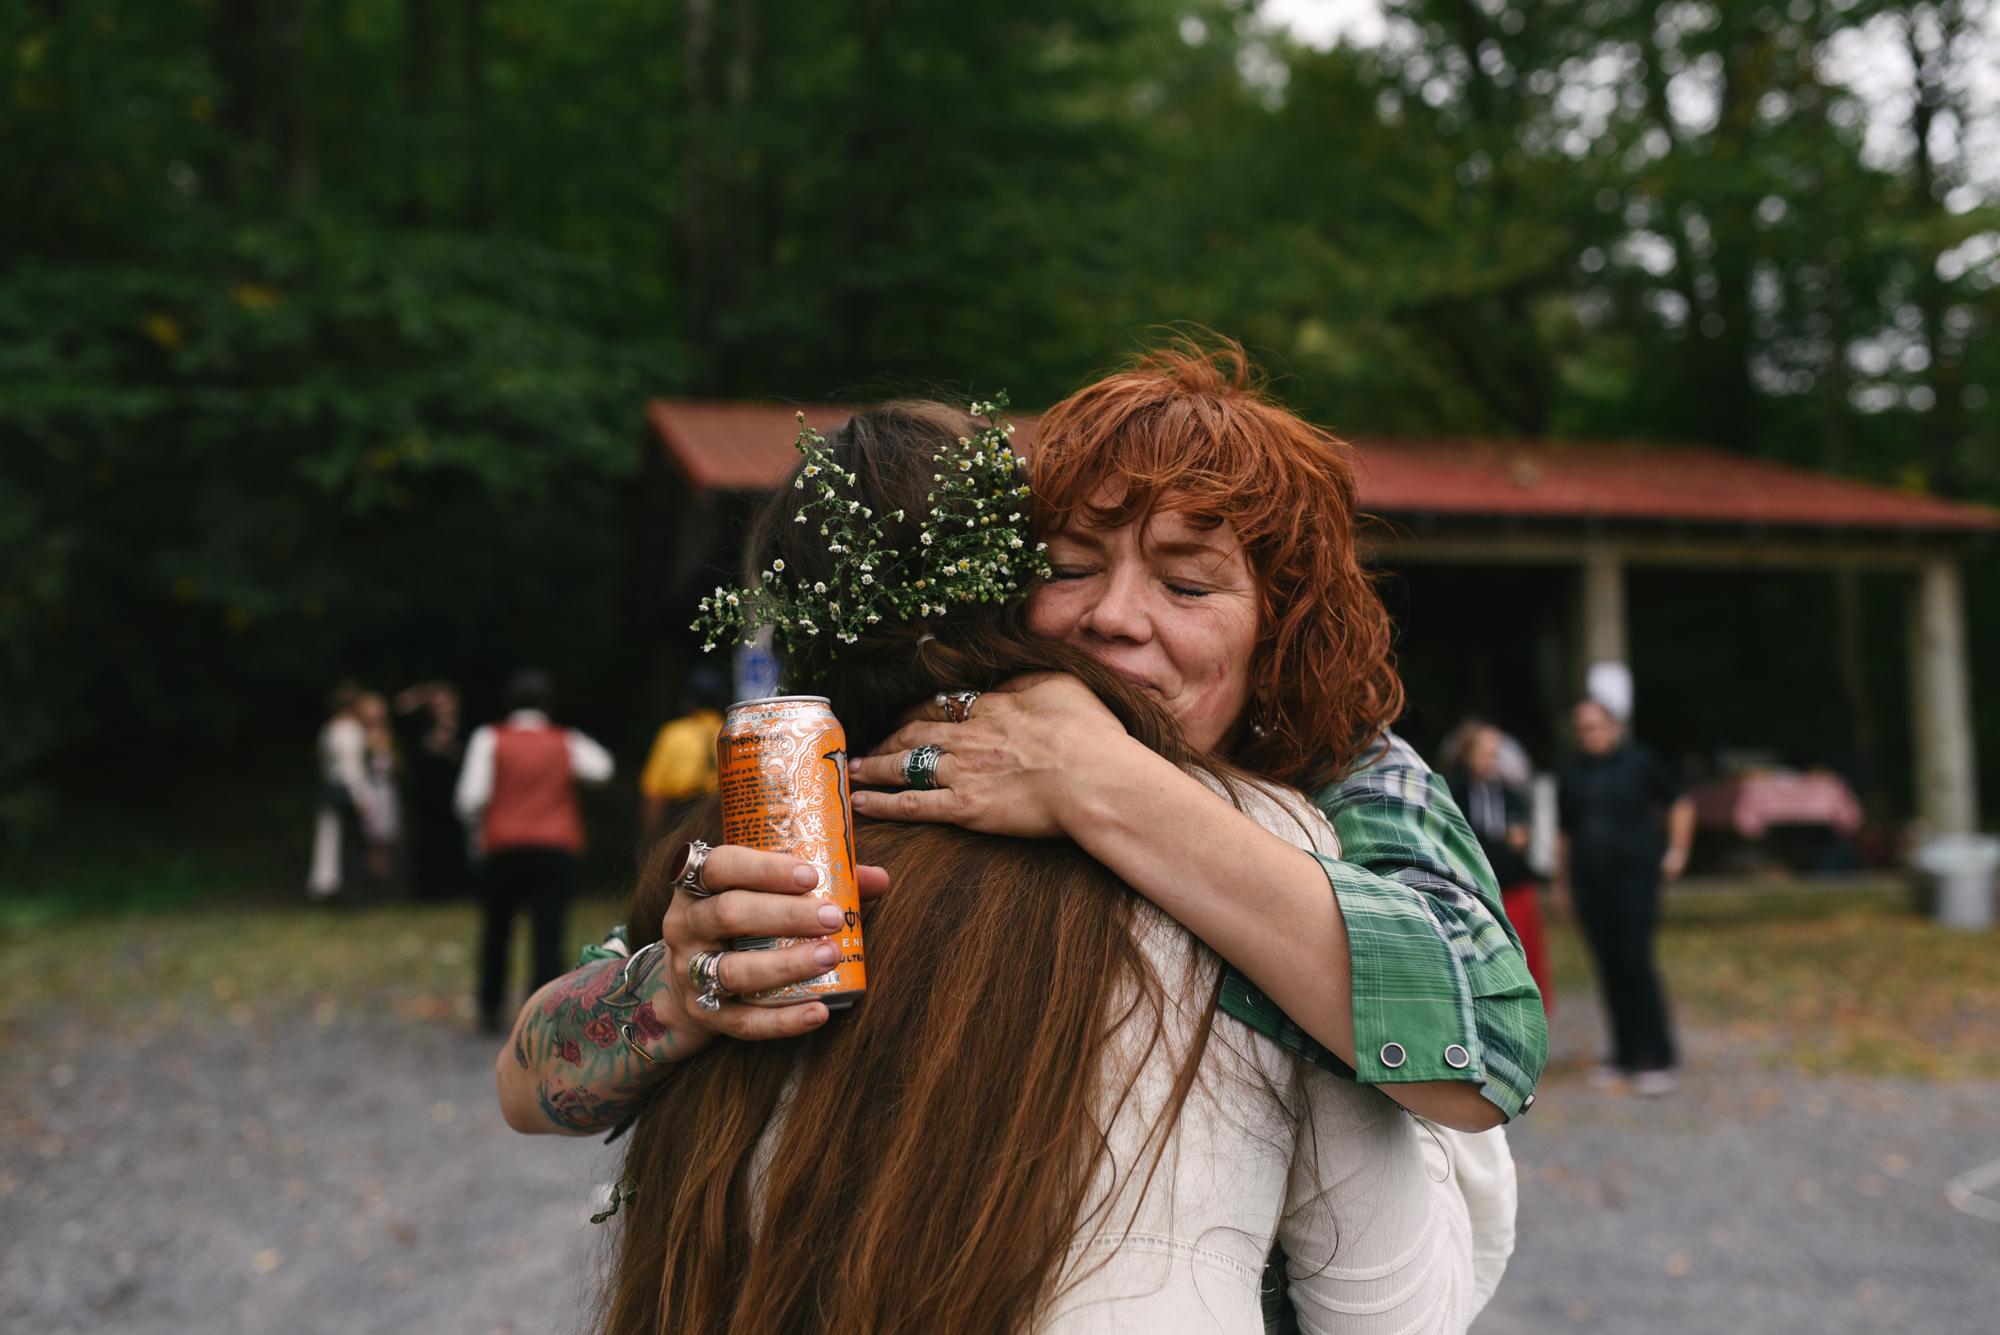 Mountain Wedding, Outdoors, Rustic, West Virginia, Maryland Wedding Photographer, DIY, Casual, Guest hugging bride at reception